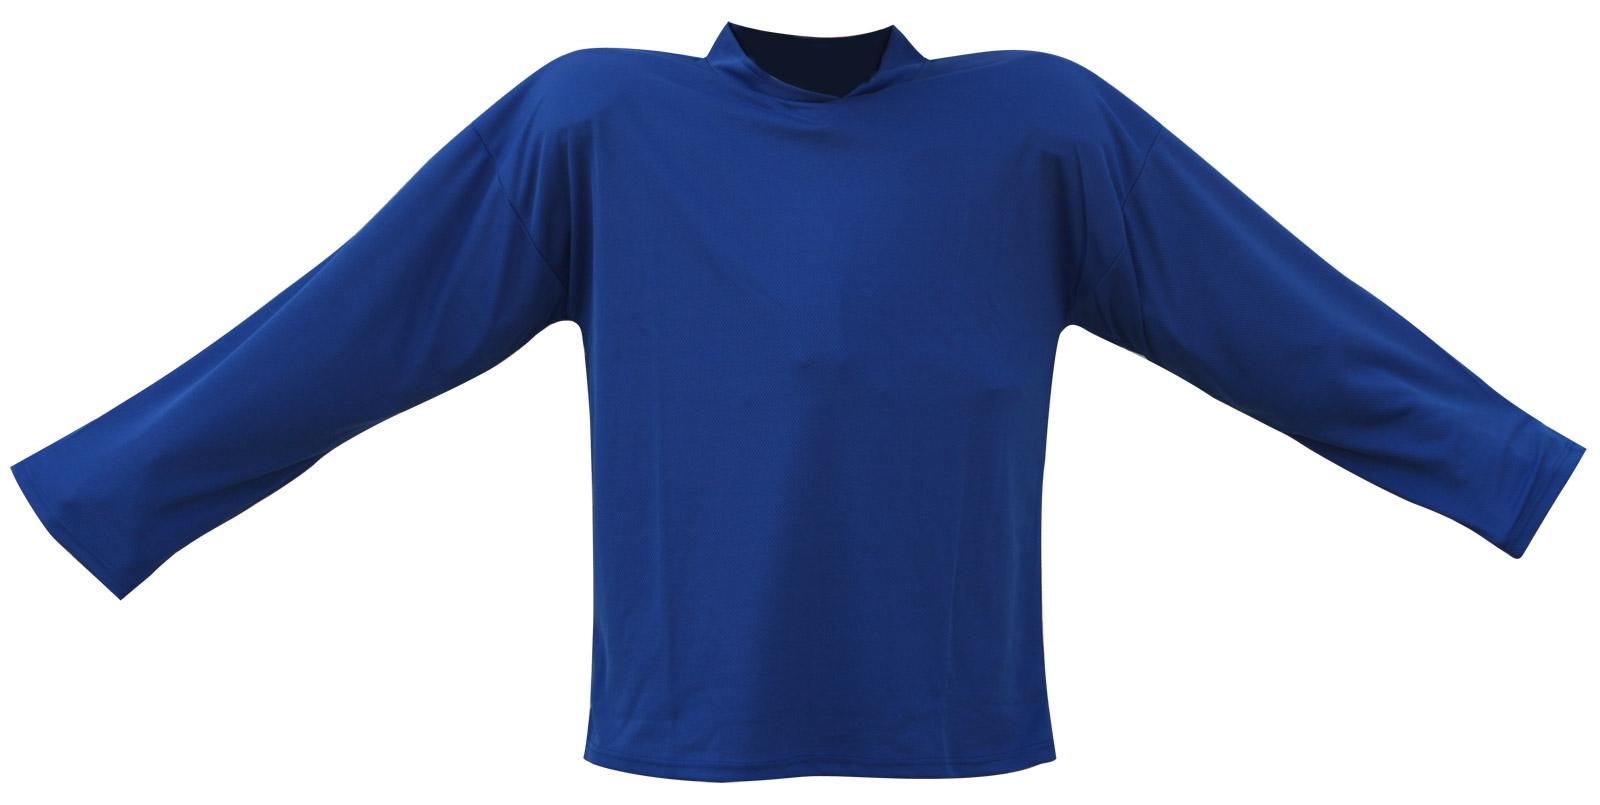 Hokejový dres modrý